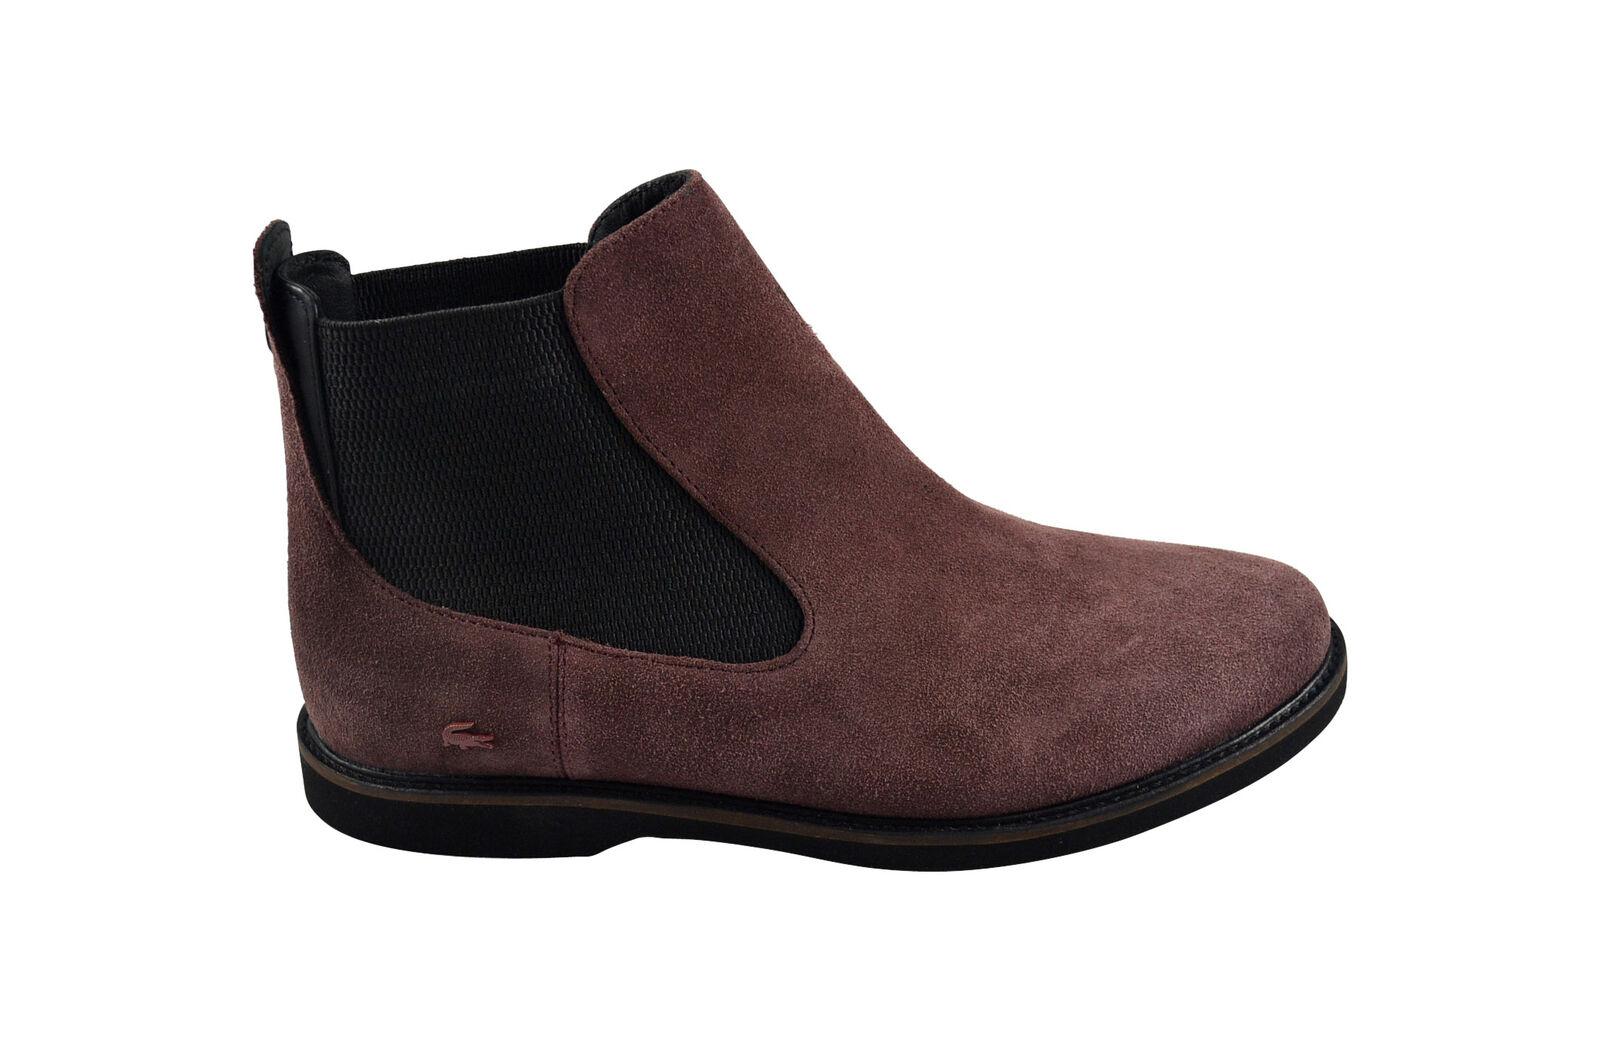 Lacoste thionna srw Dark Bourgogne Bottes Chaussures